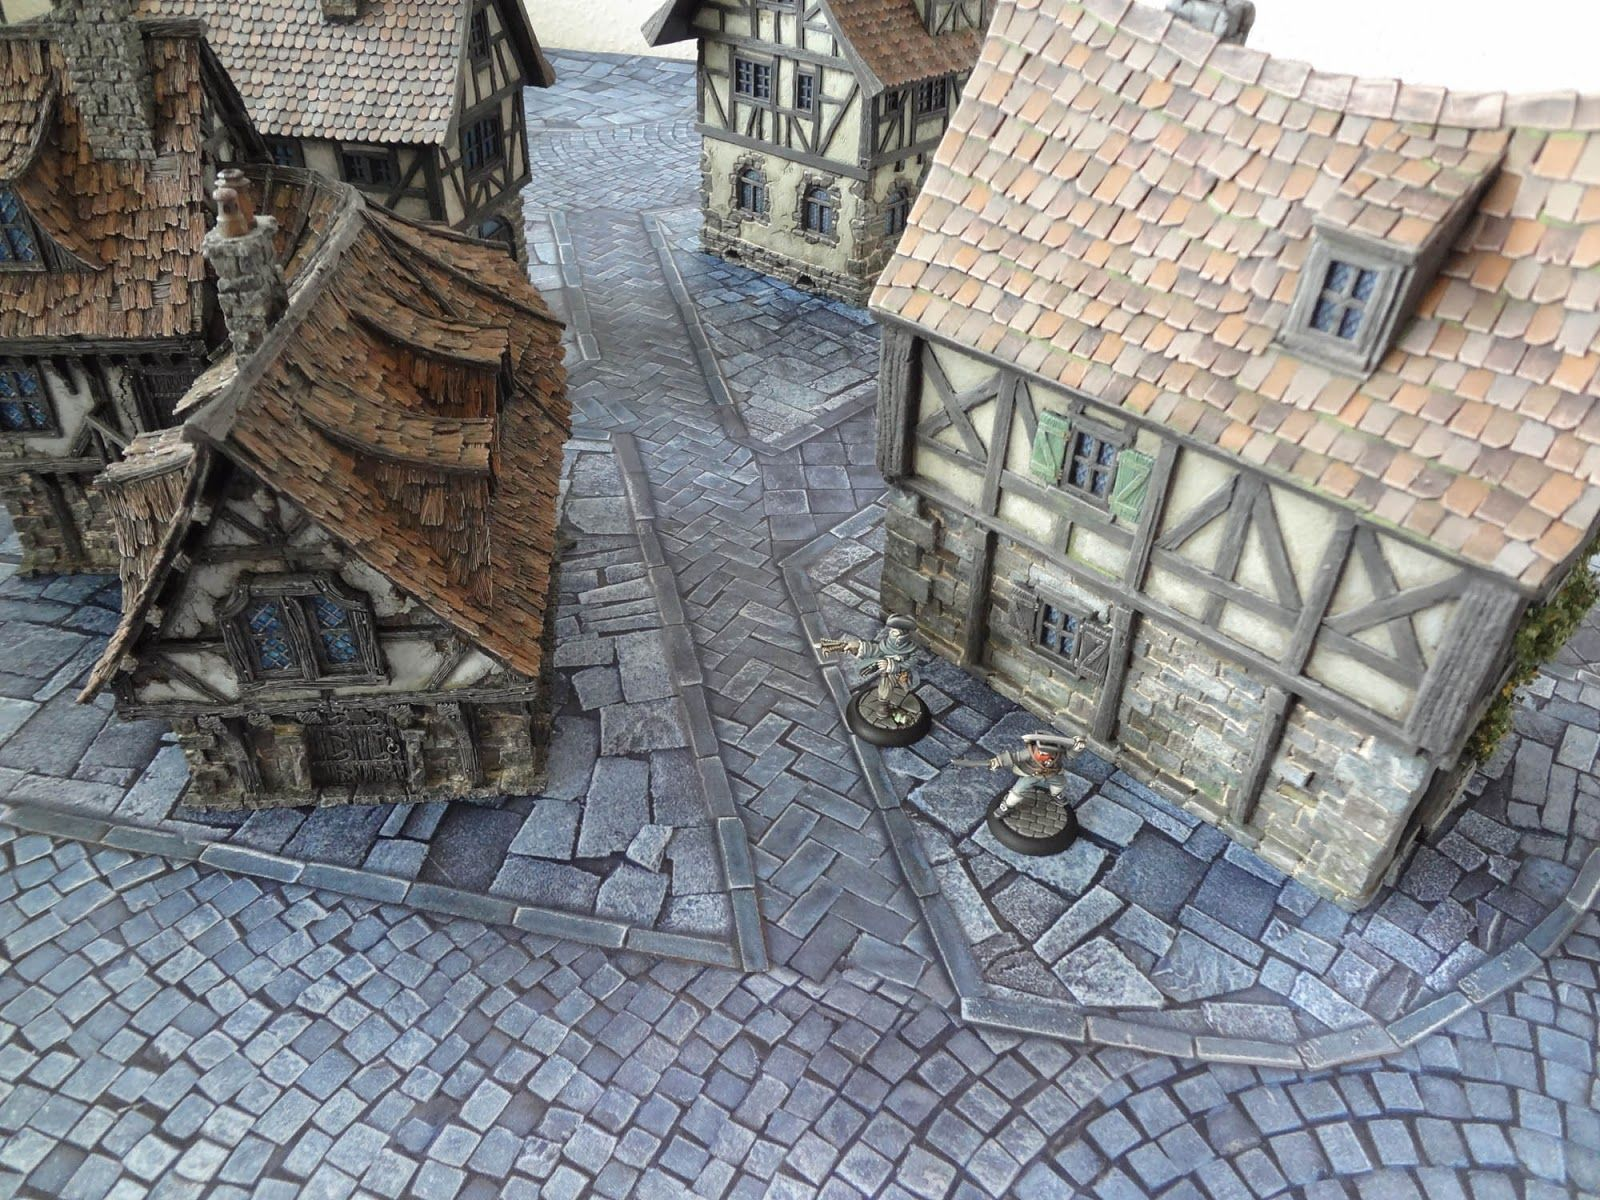 Cianty S Tabletop Wargames Blog Cobblestone Gaming Mat From Kraken Wargames Wargaming Terrain Warhammer Terrain Cobblestone